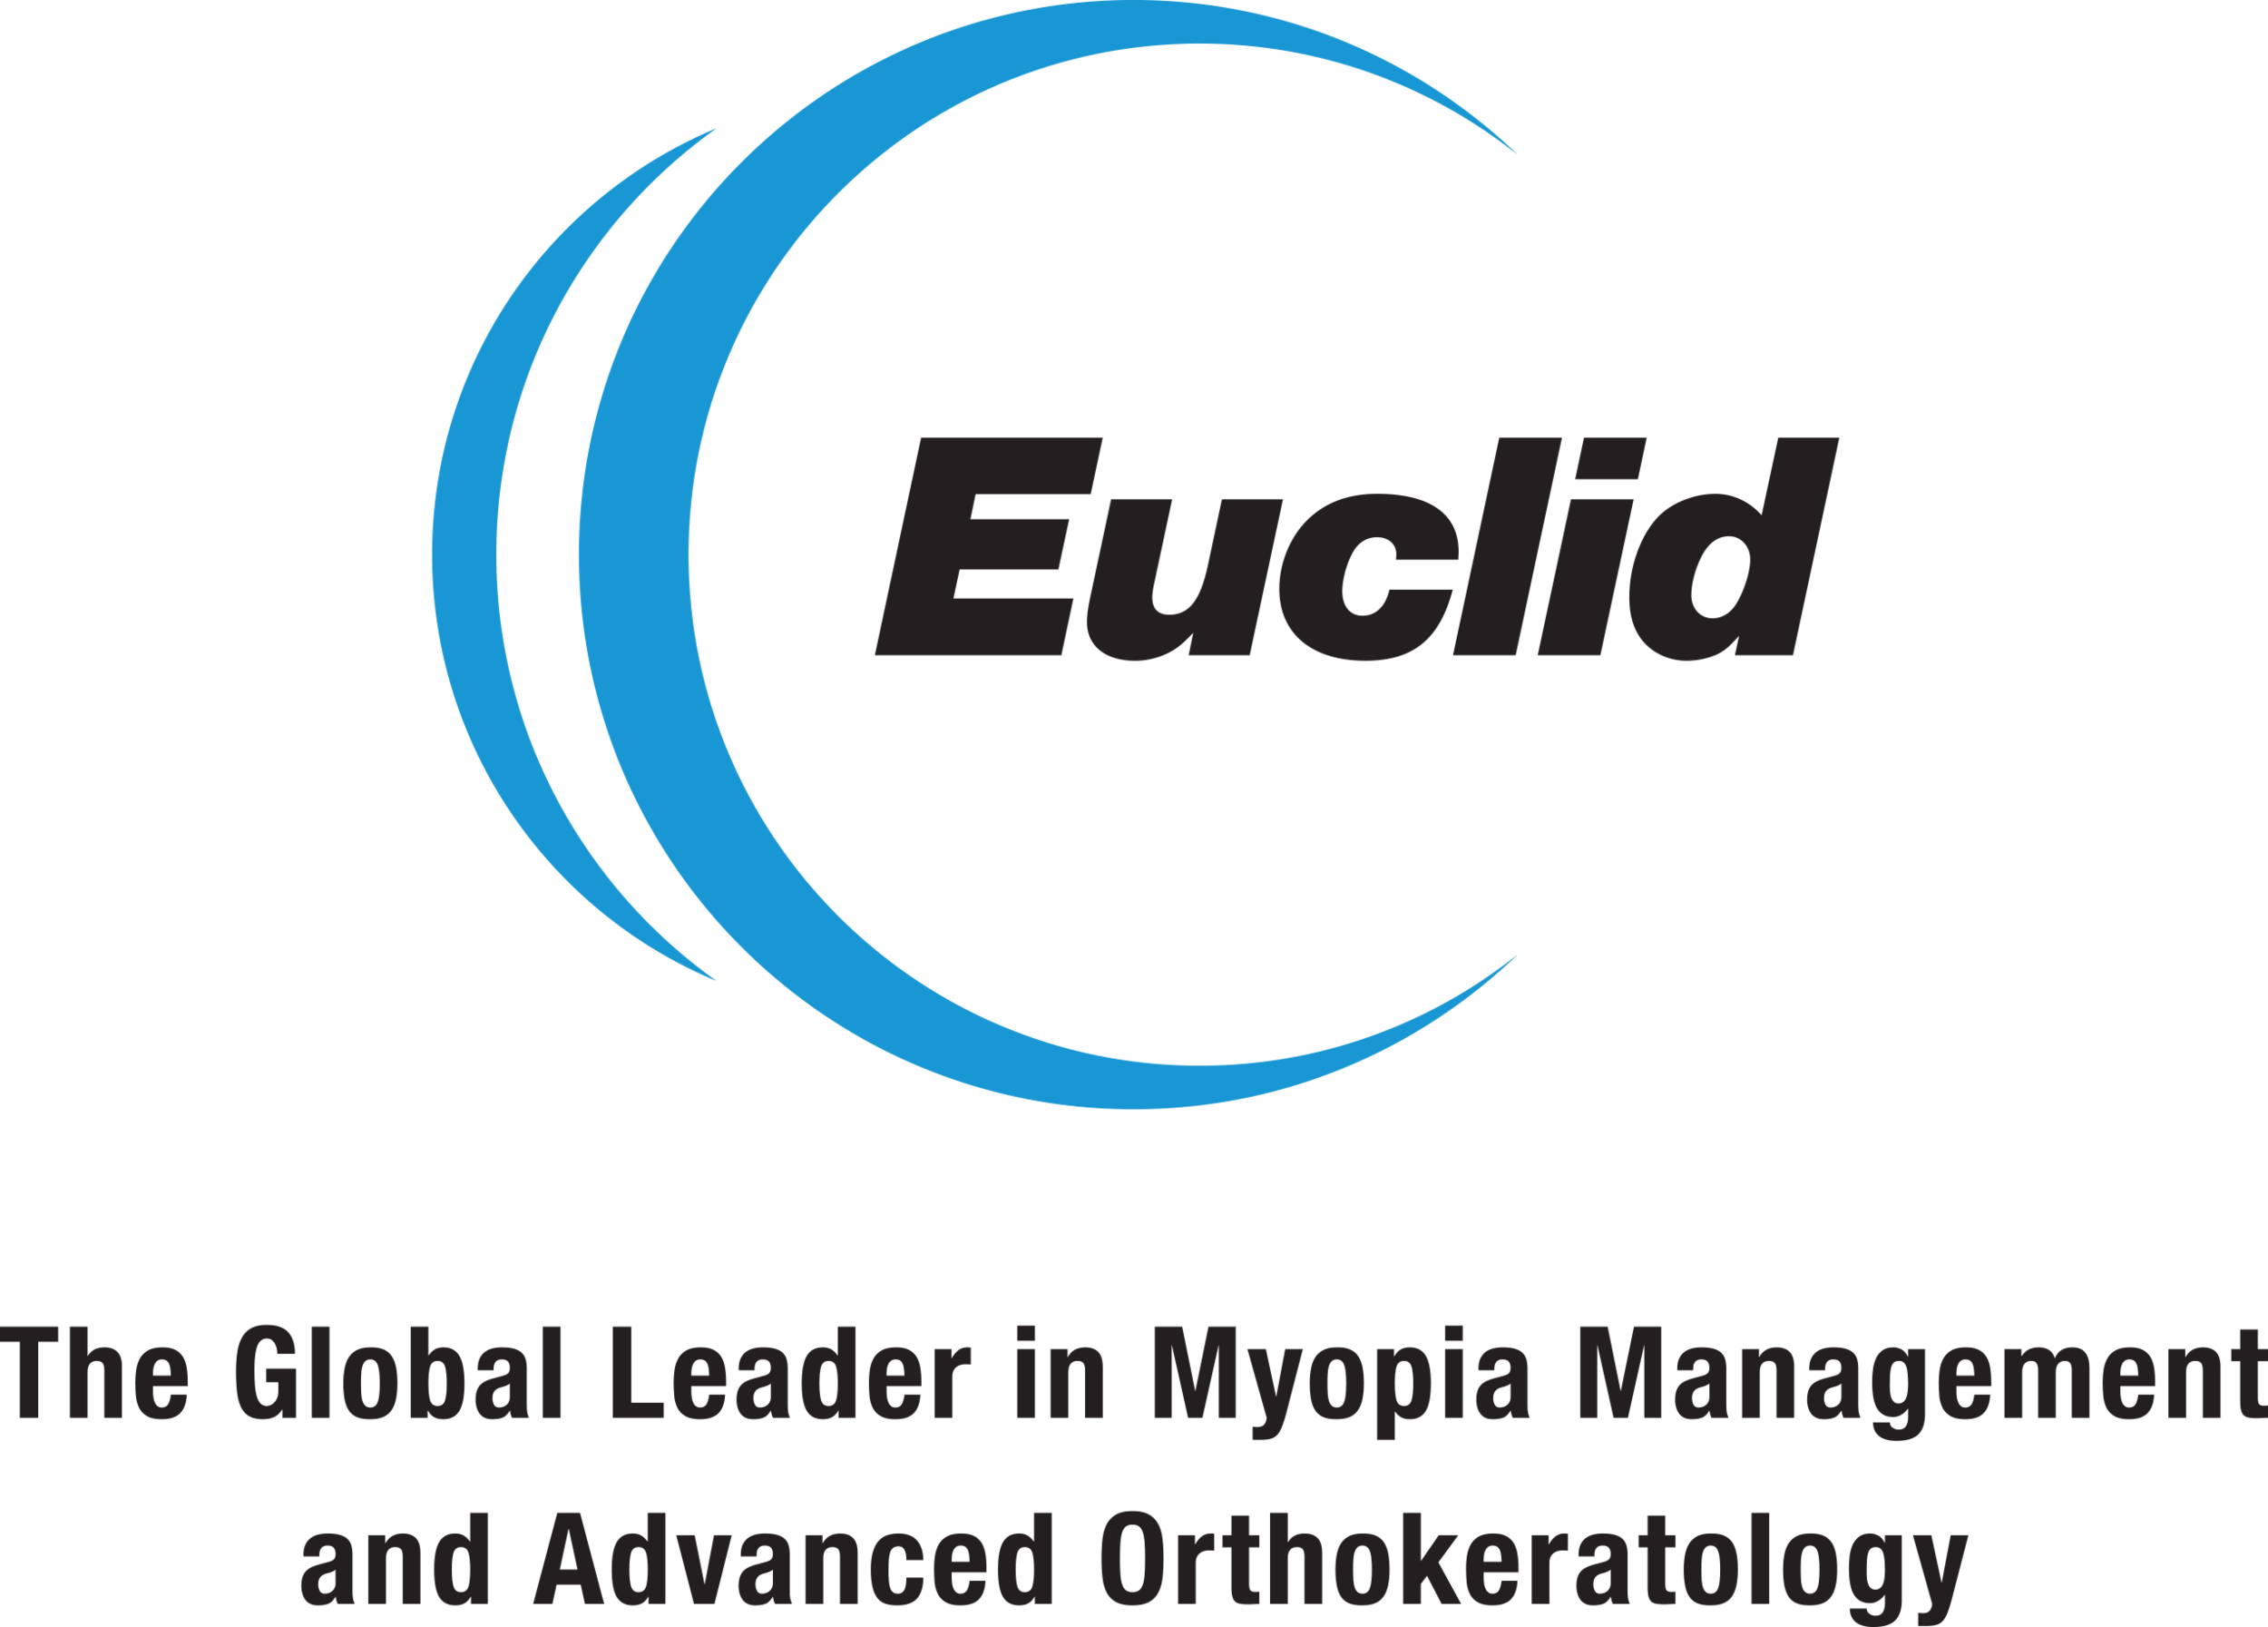 euclid-logo-tag-black-bolder-2-lines (1).png